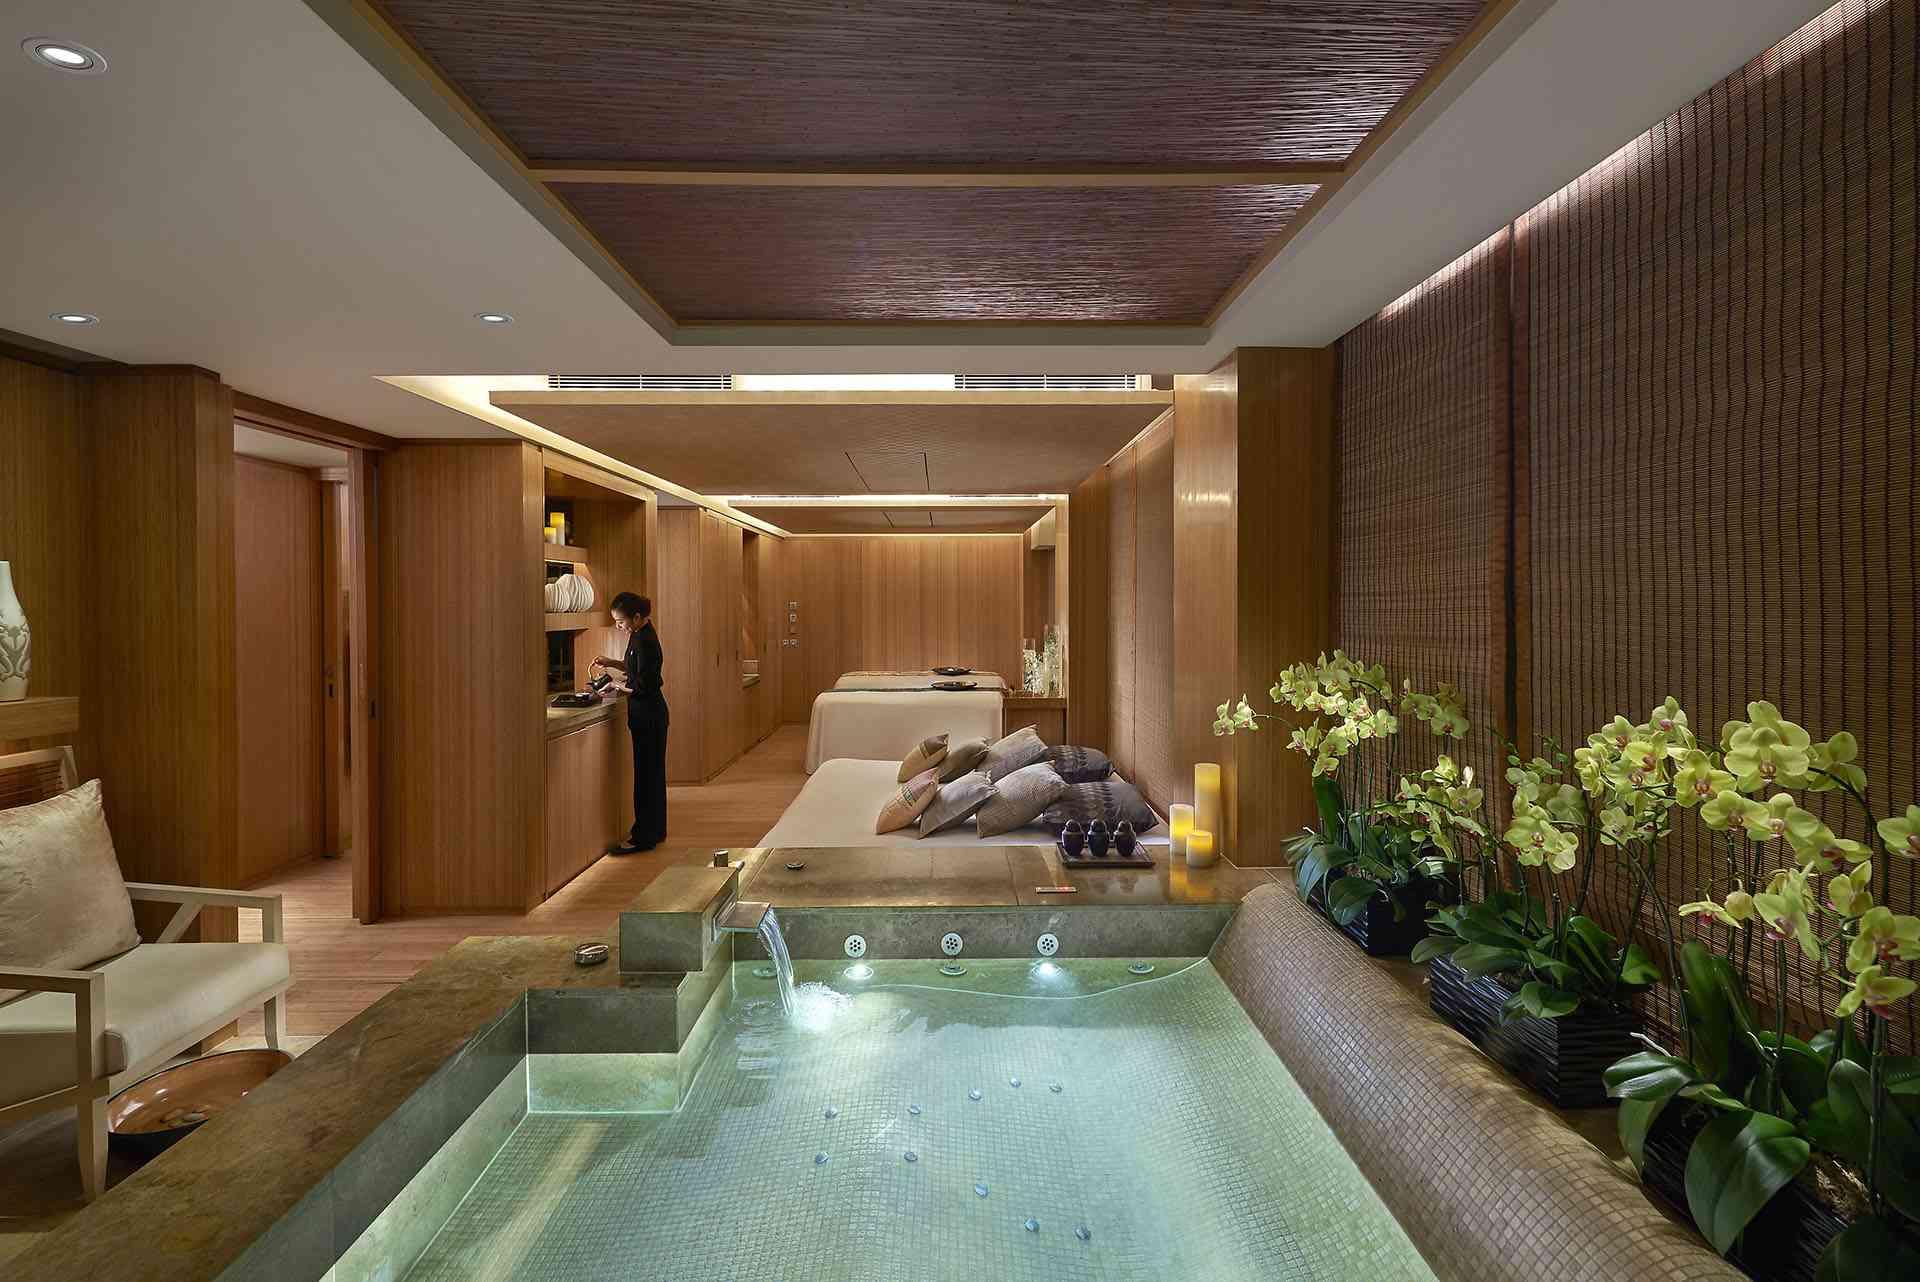 Oriental Spa at the Landmark Mandarin Oriental Hotel